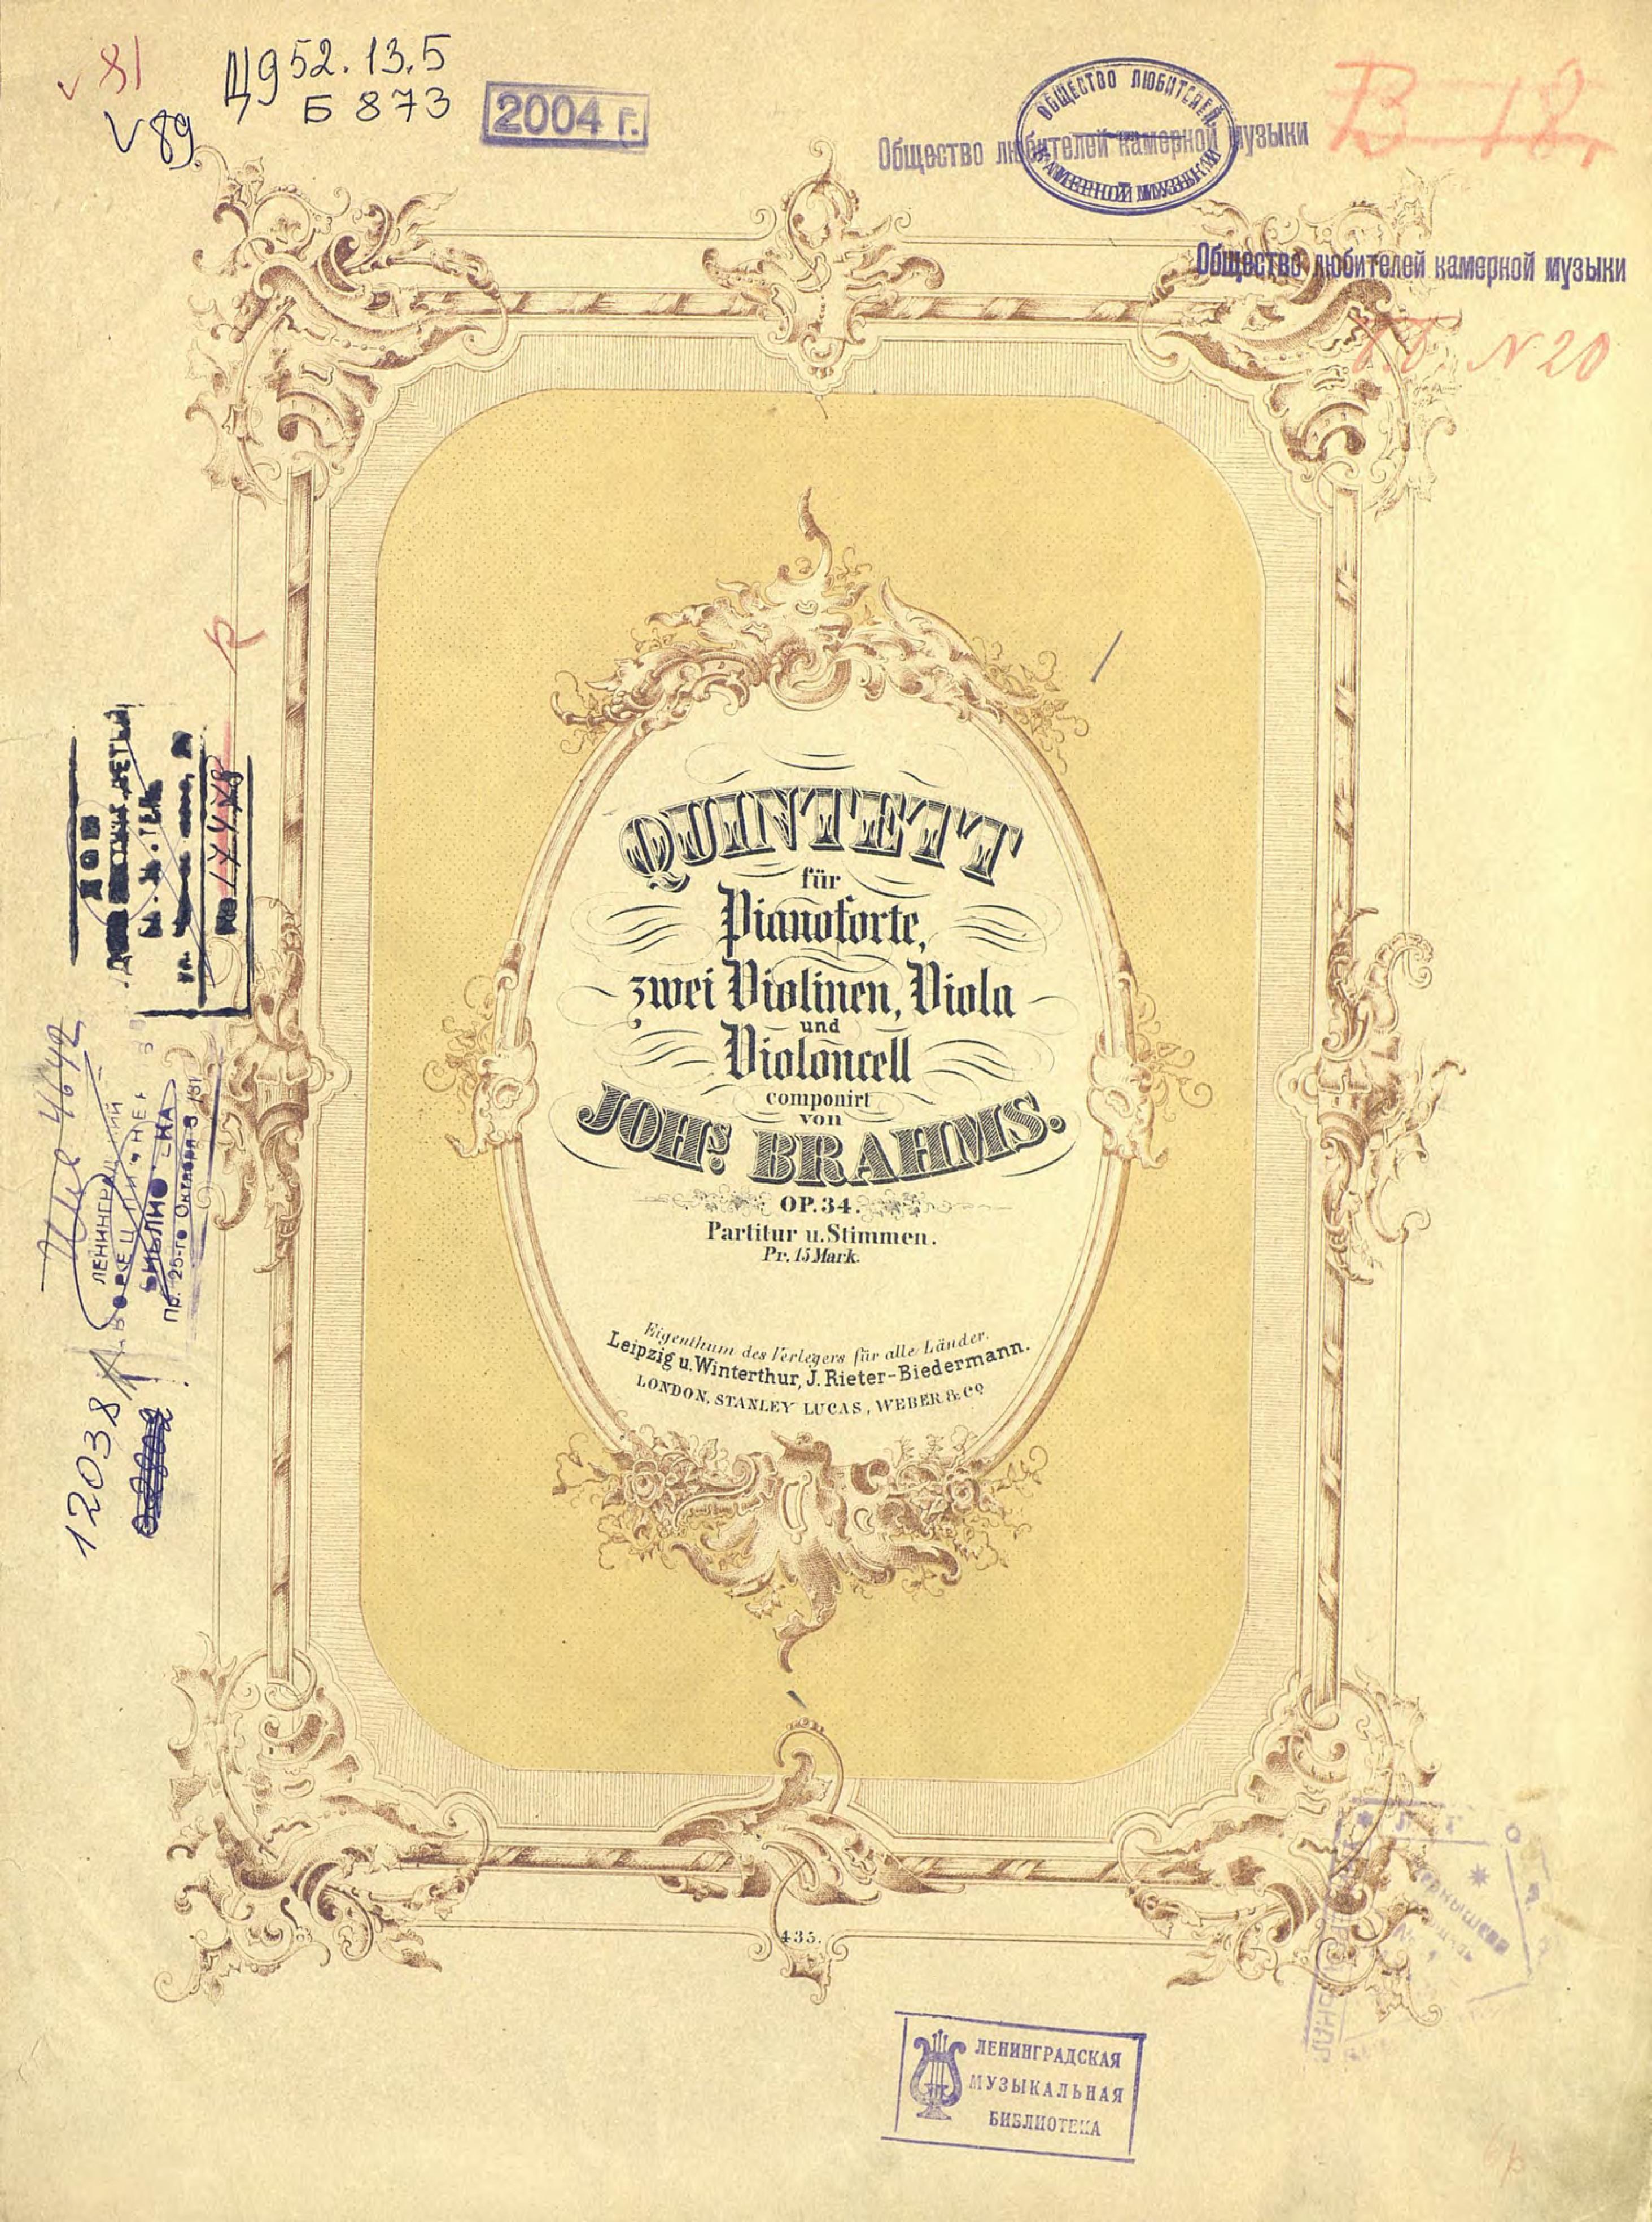 Иоганнес Брамс Quintett fur Pianoforte, 2 Violinen, Viola und Violoncell comp. v. Joh's Brahms джузеппе верди quartett fur 2 violinen viola und violoncell v g verdi e moll